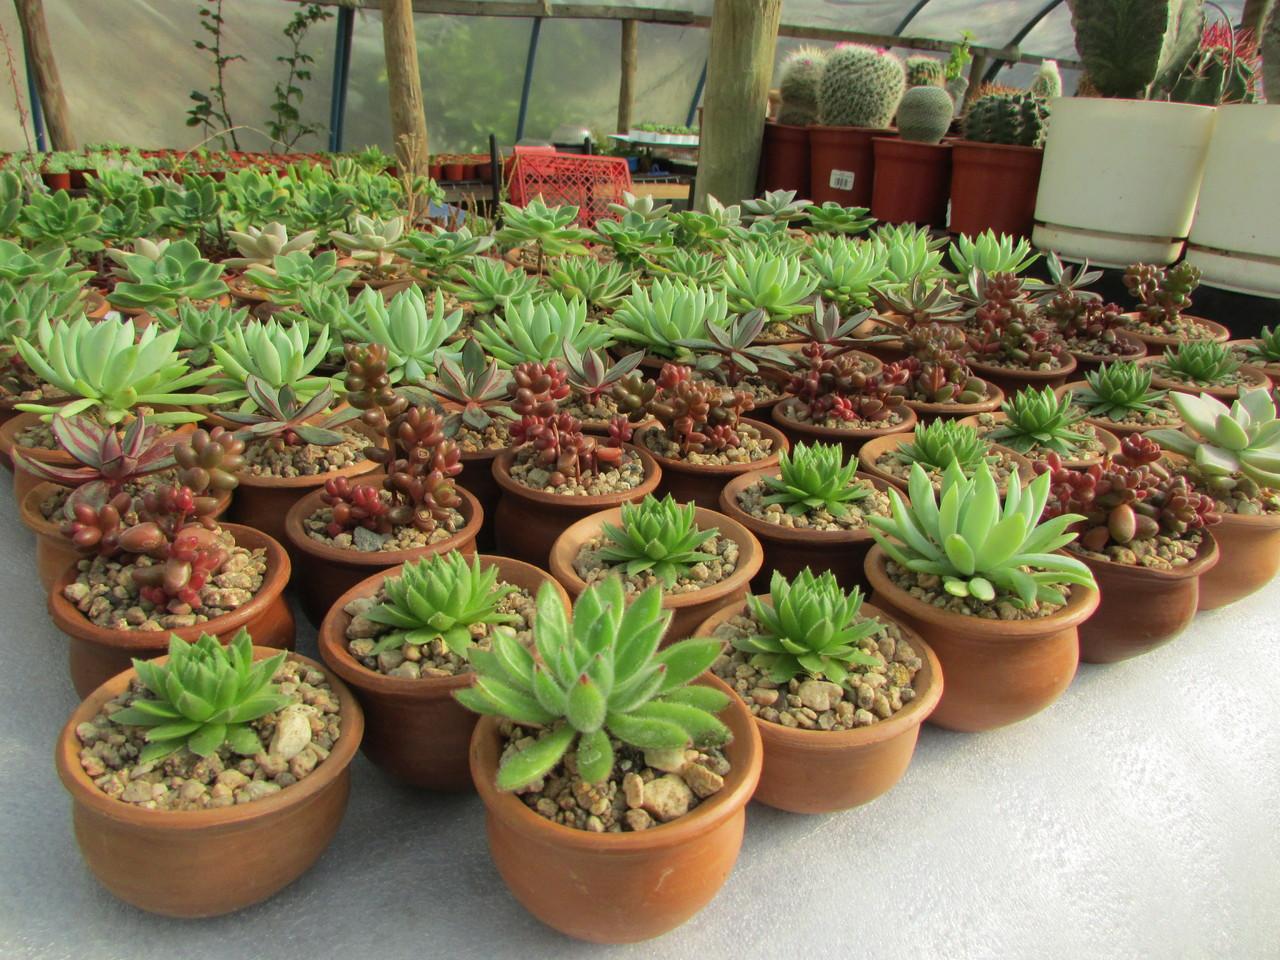 Cactus matrimonio evento vivero nacimiento cactus y for Suculentas chile